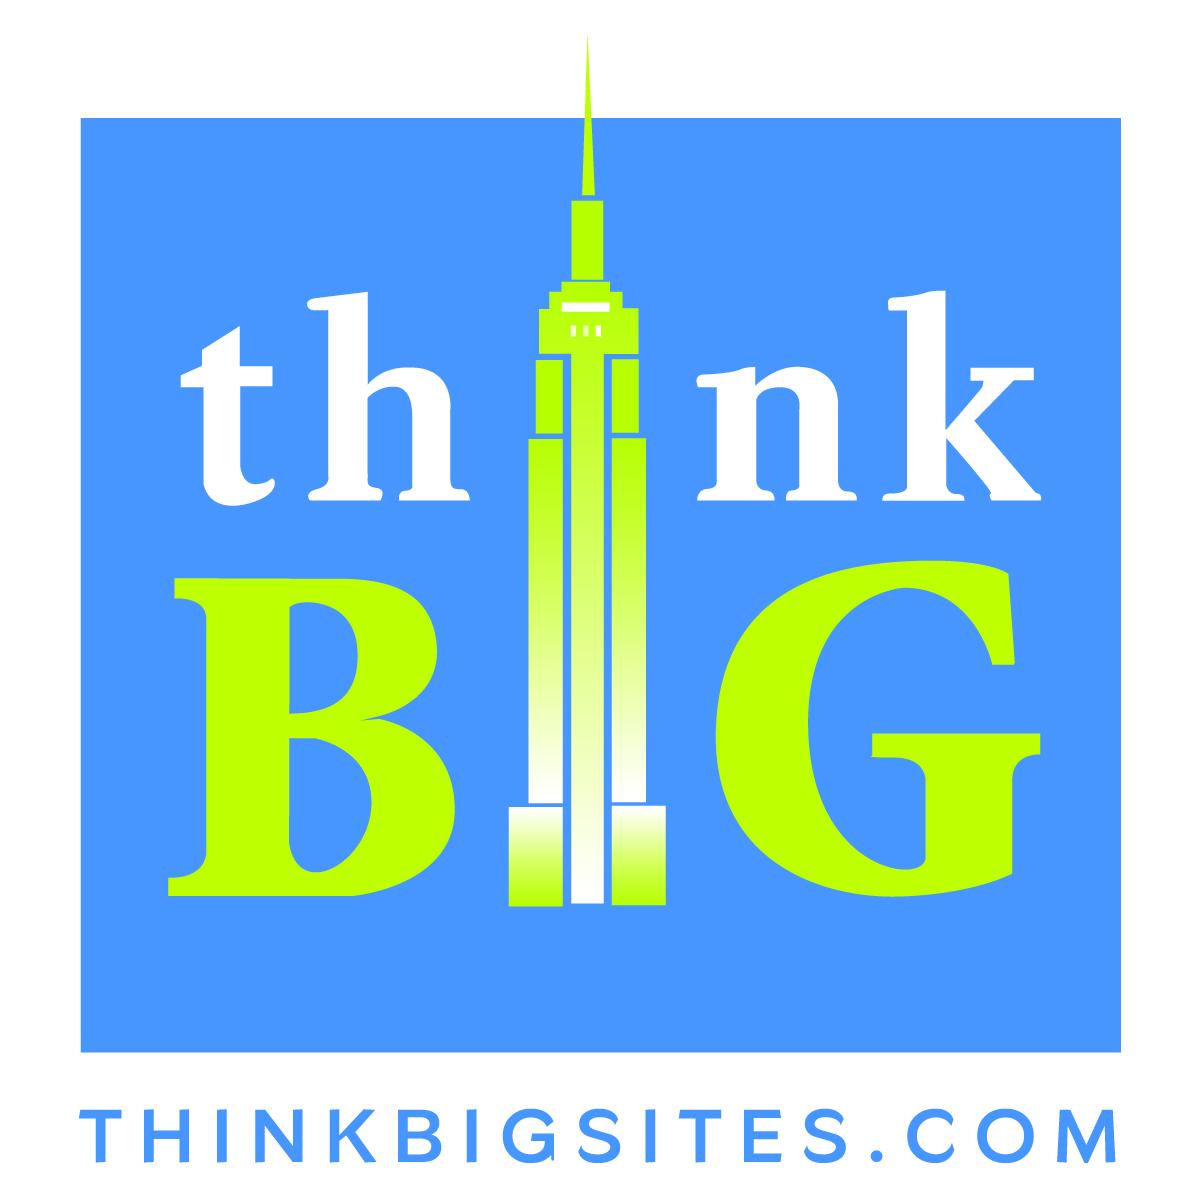 ThinkBIGsites